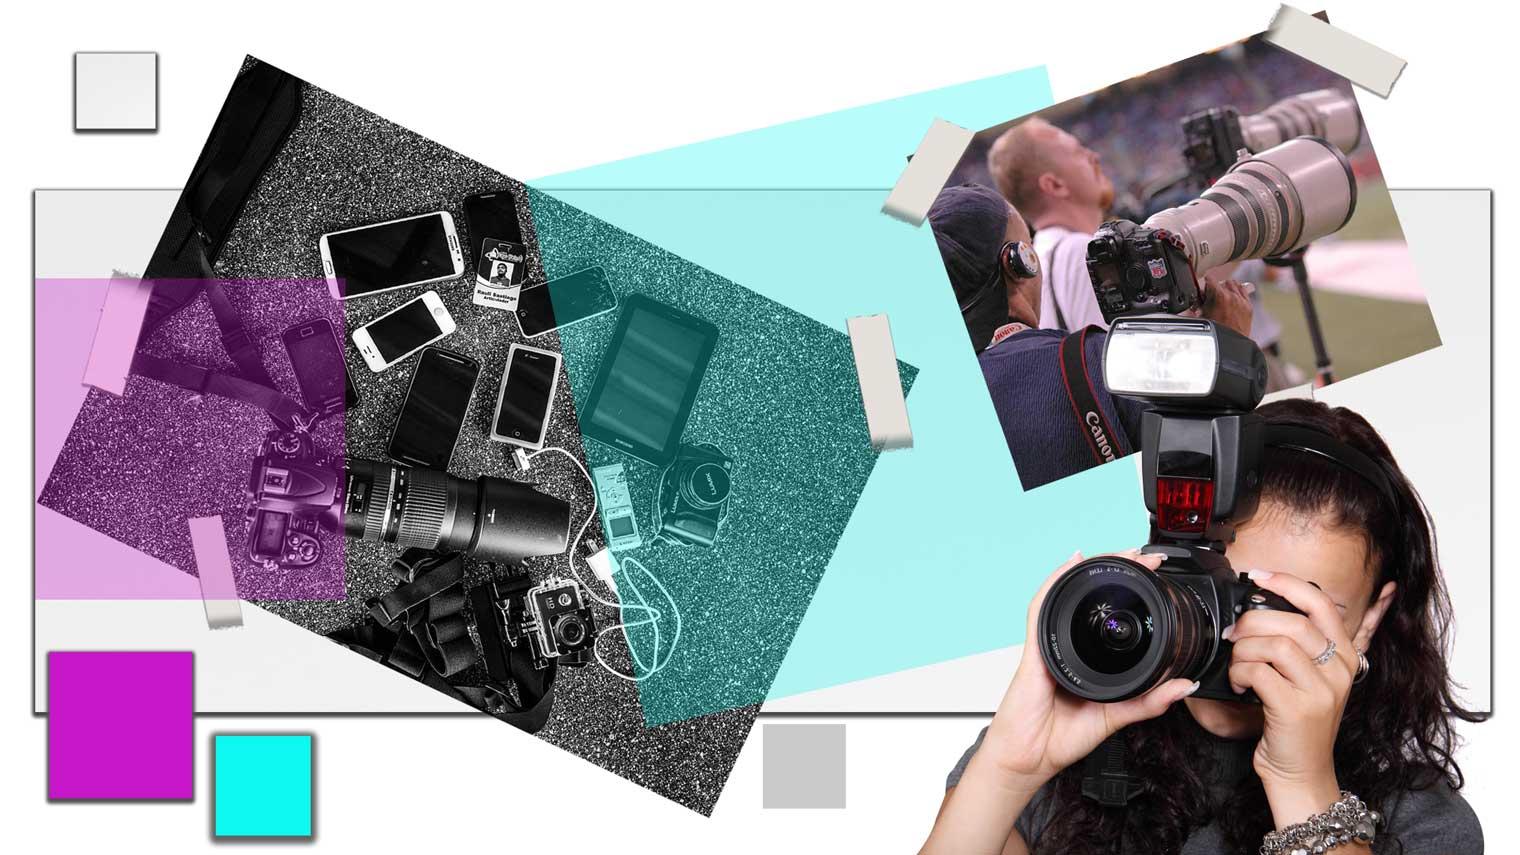 professiona1 photographe 112a - چگونه میتوان حرفه عکاسی را برای همیشه داشت ؟